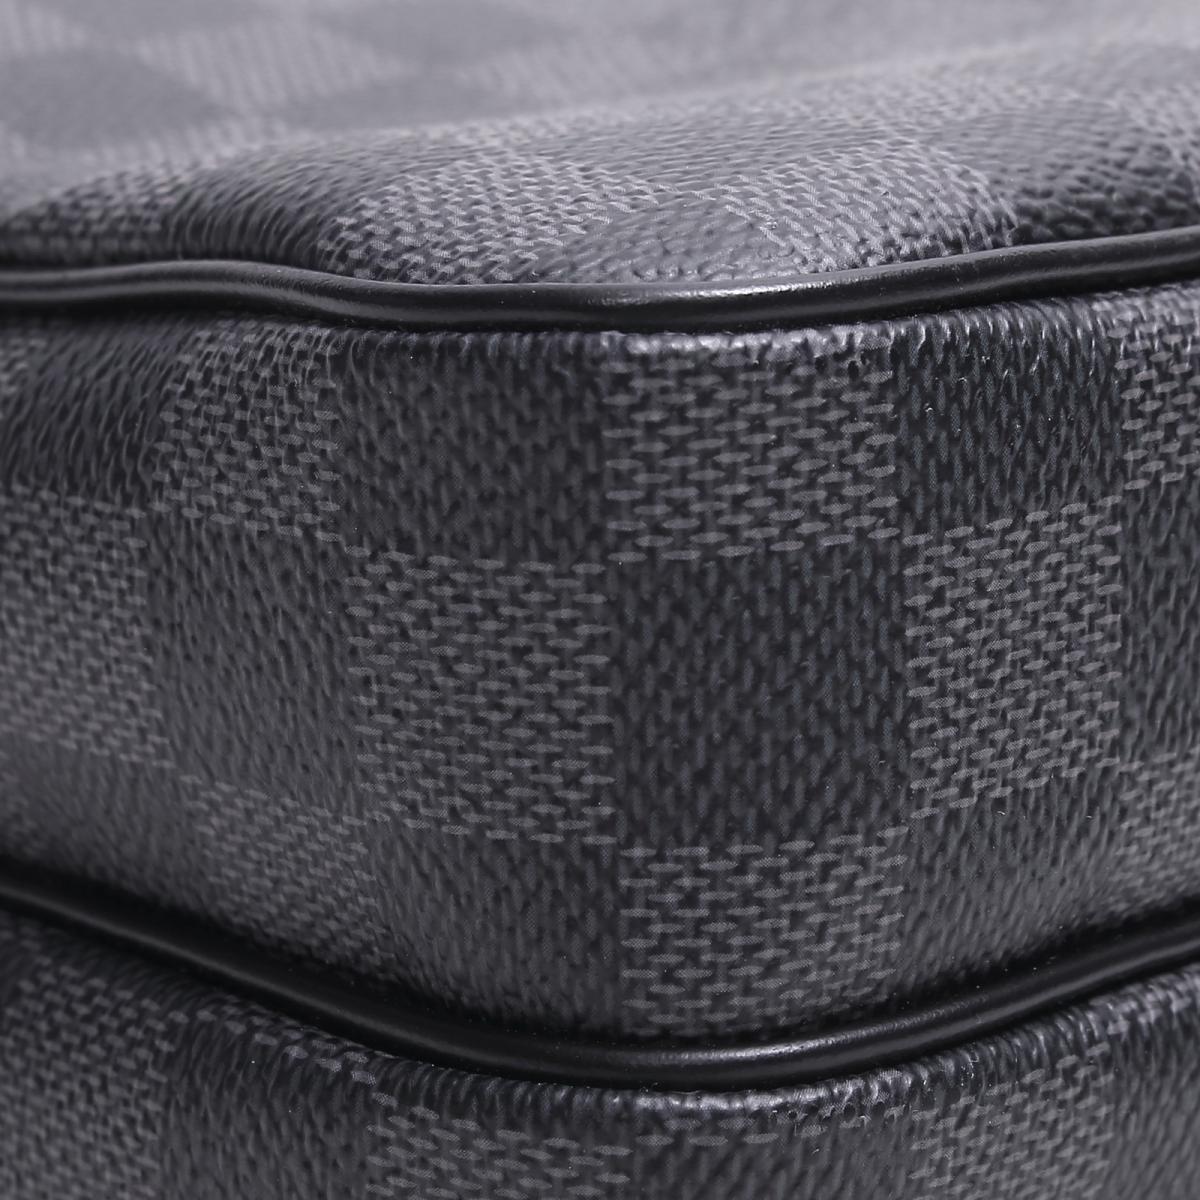 LOUIS VUITTON バッグ N41446 【おすすめ!】レム ショルダー メンズ